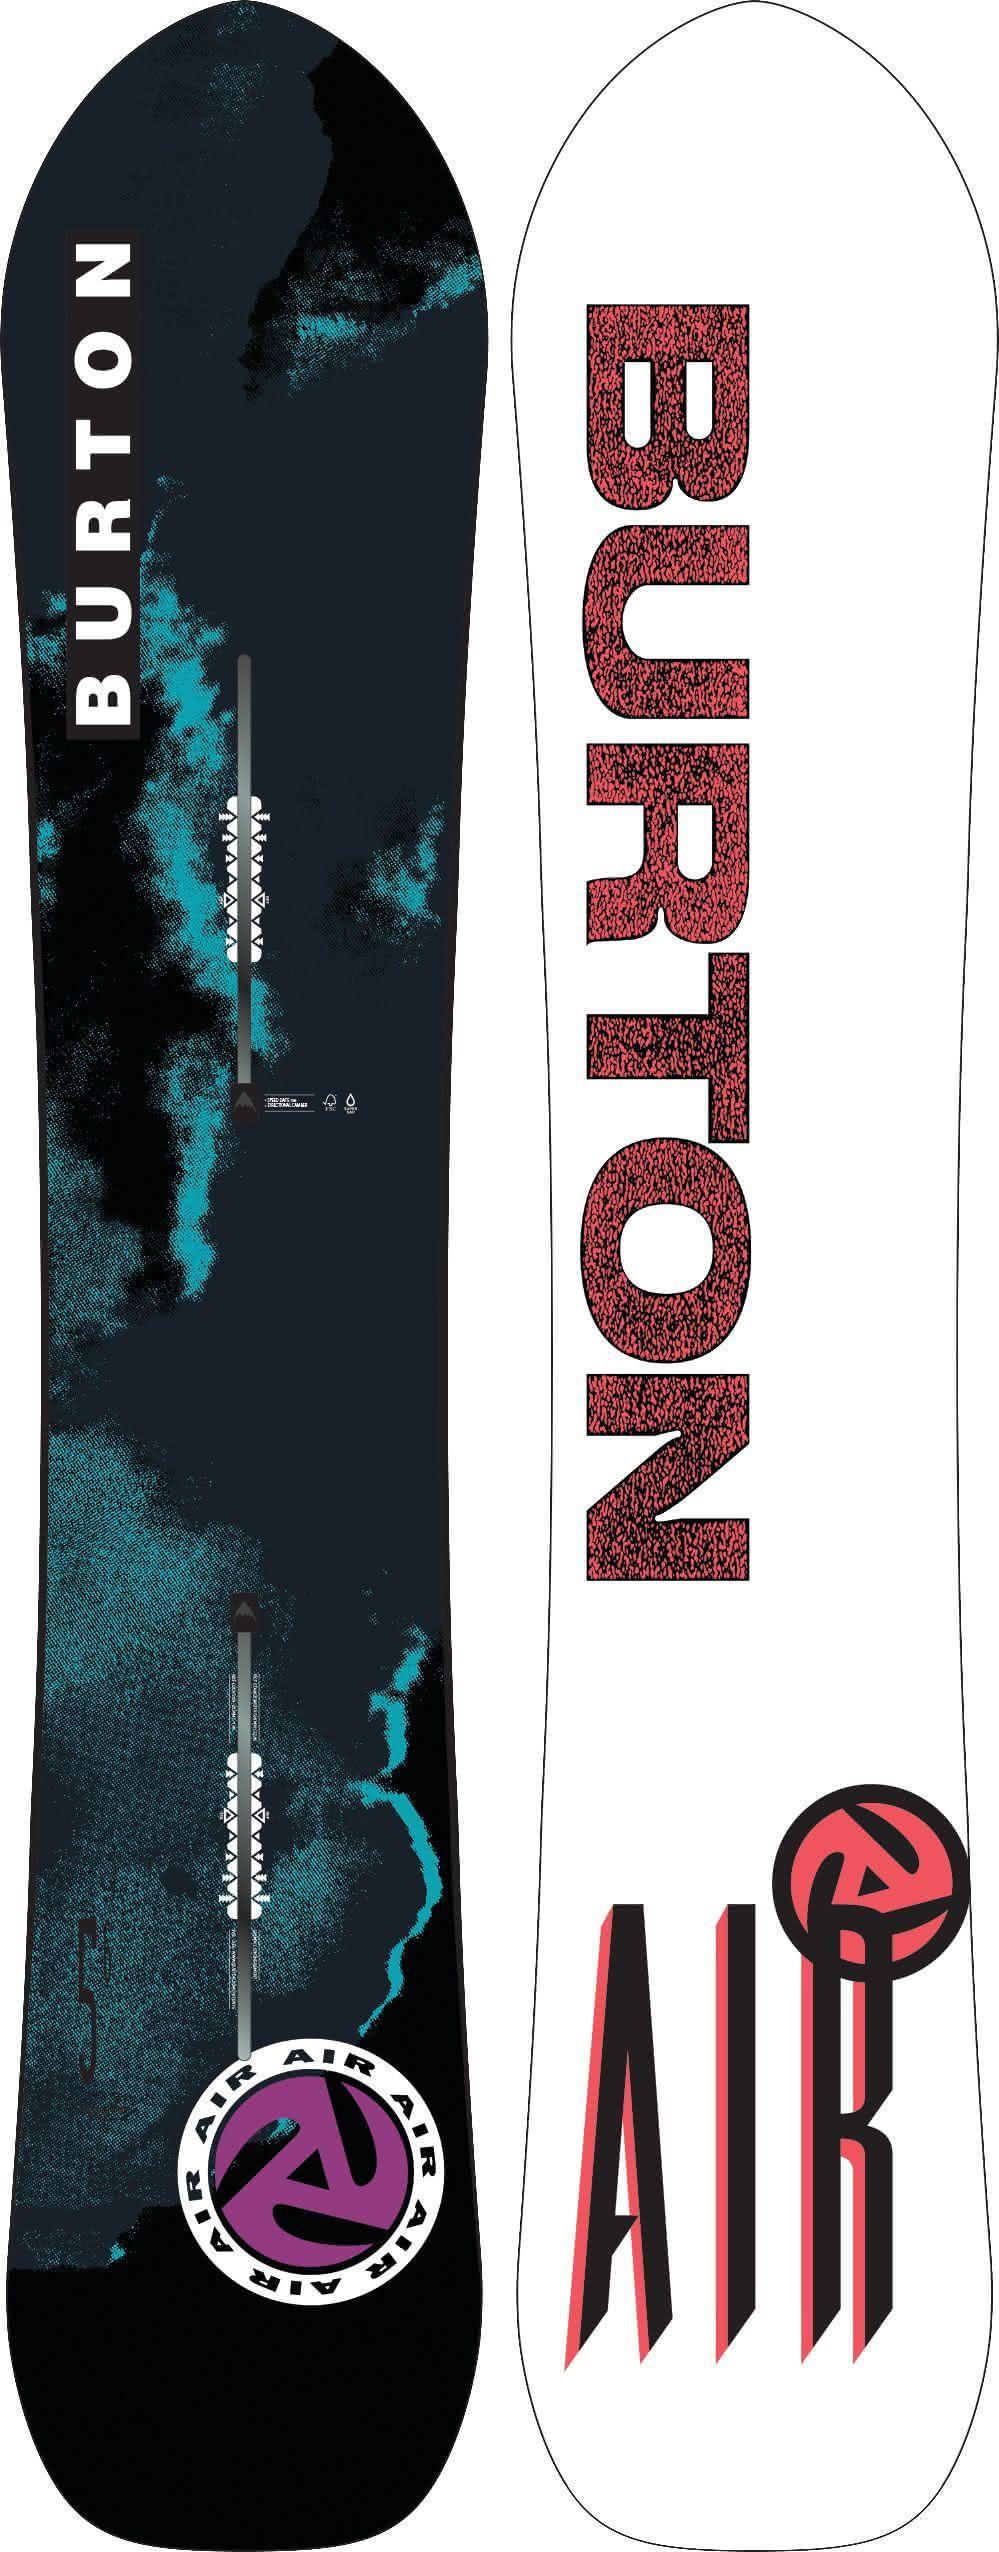 Deska Snowboardowa Burton Family Tree Speed Date Retro (156) W19